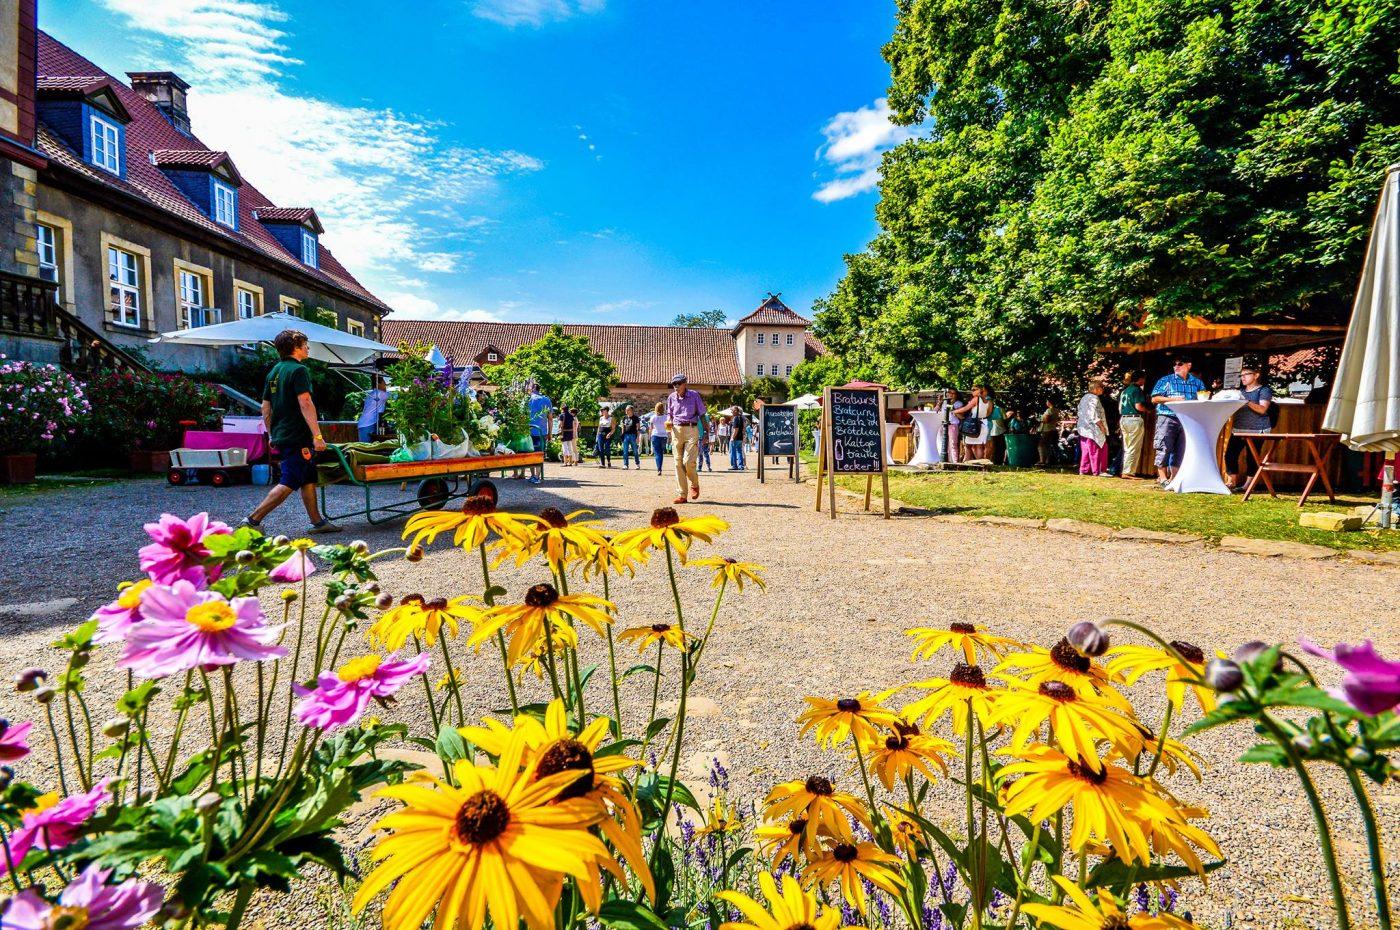 Parkfestival Romantic Garden auf dem Rittergut Remeringhausen